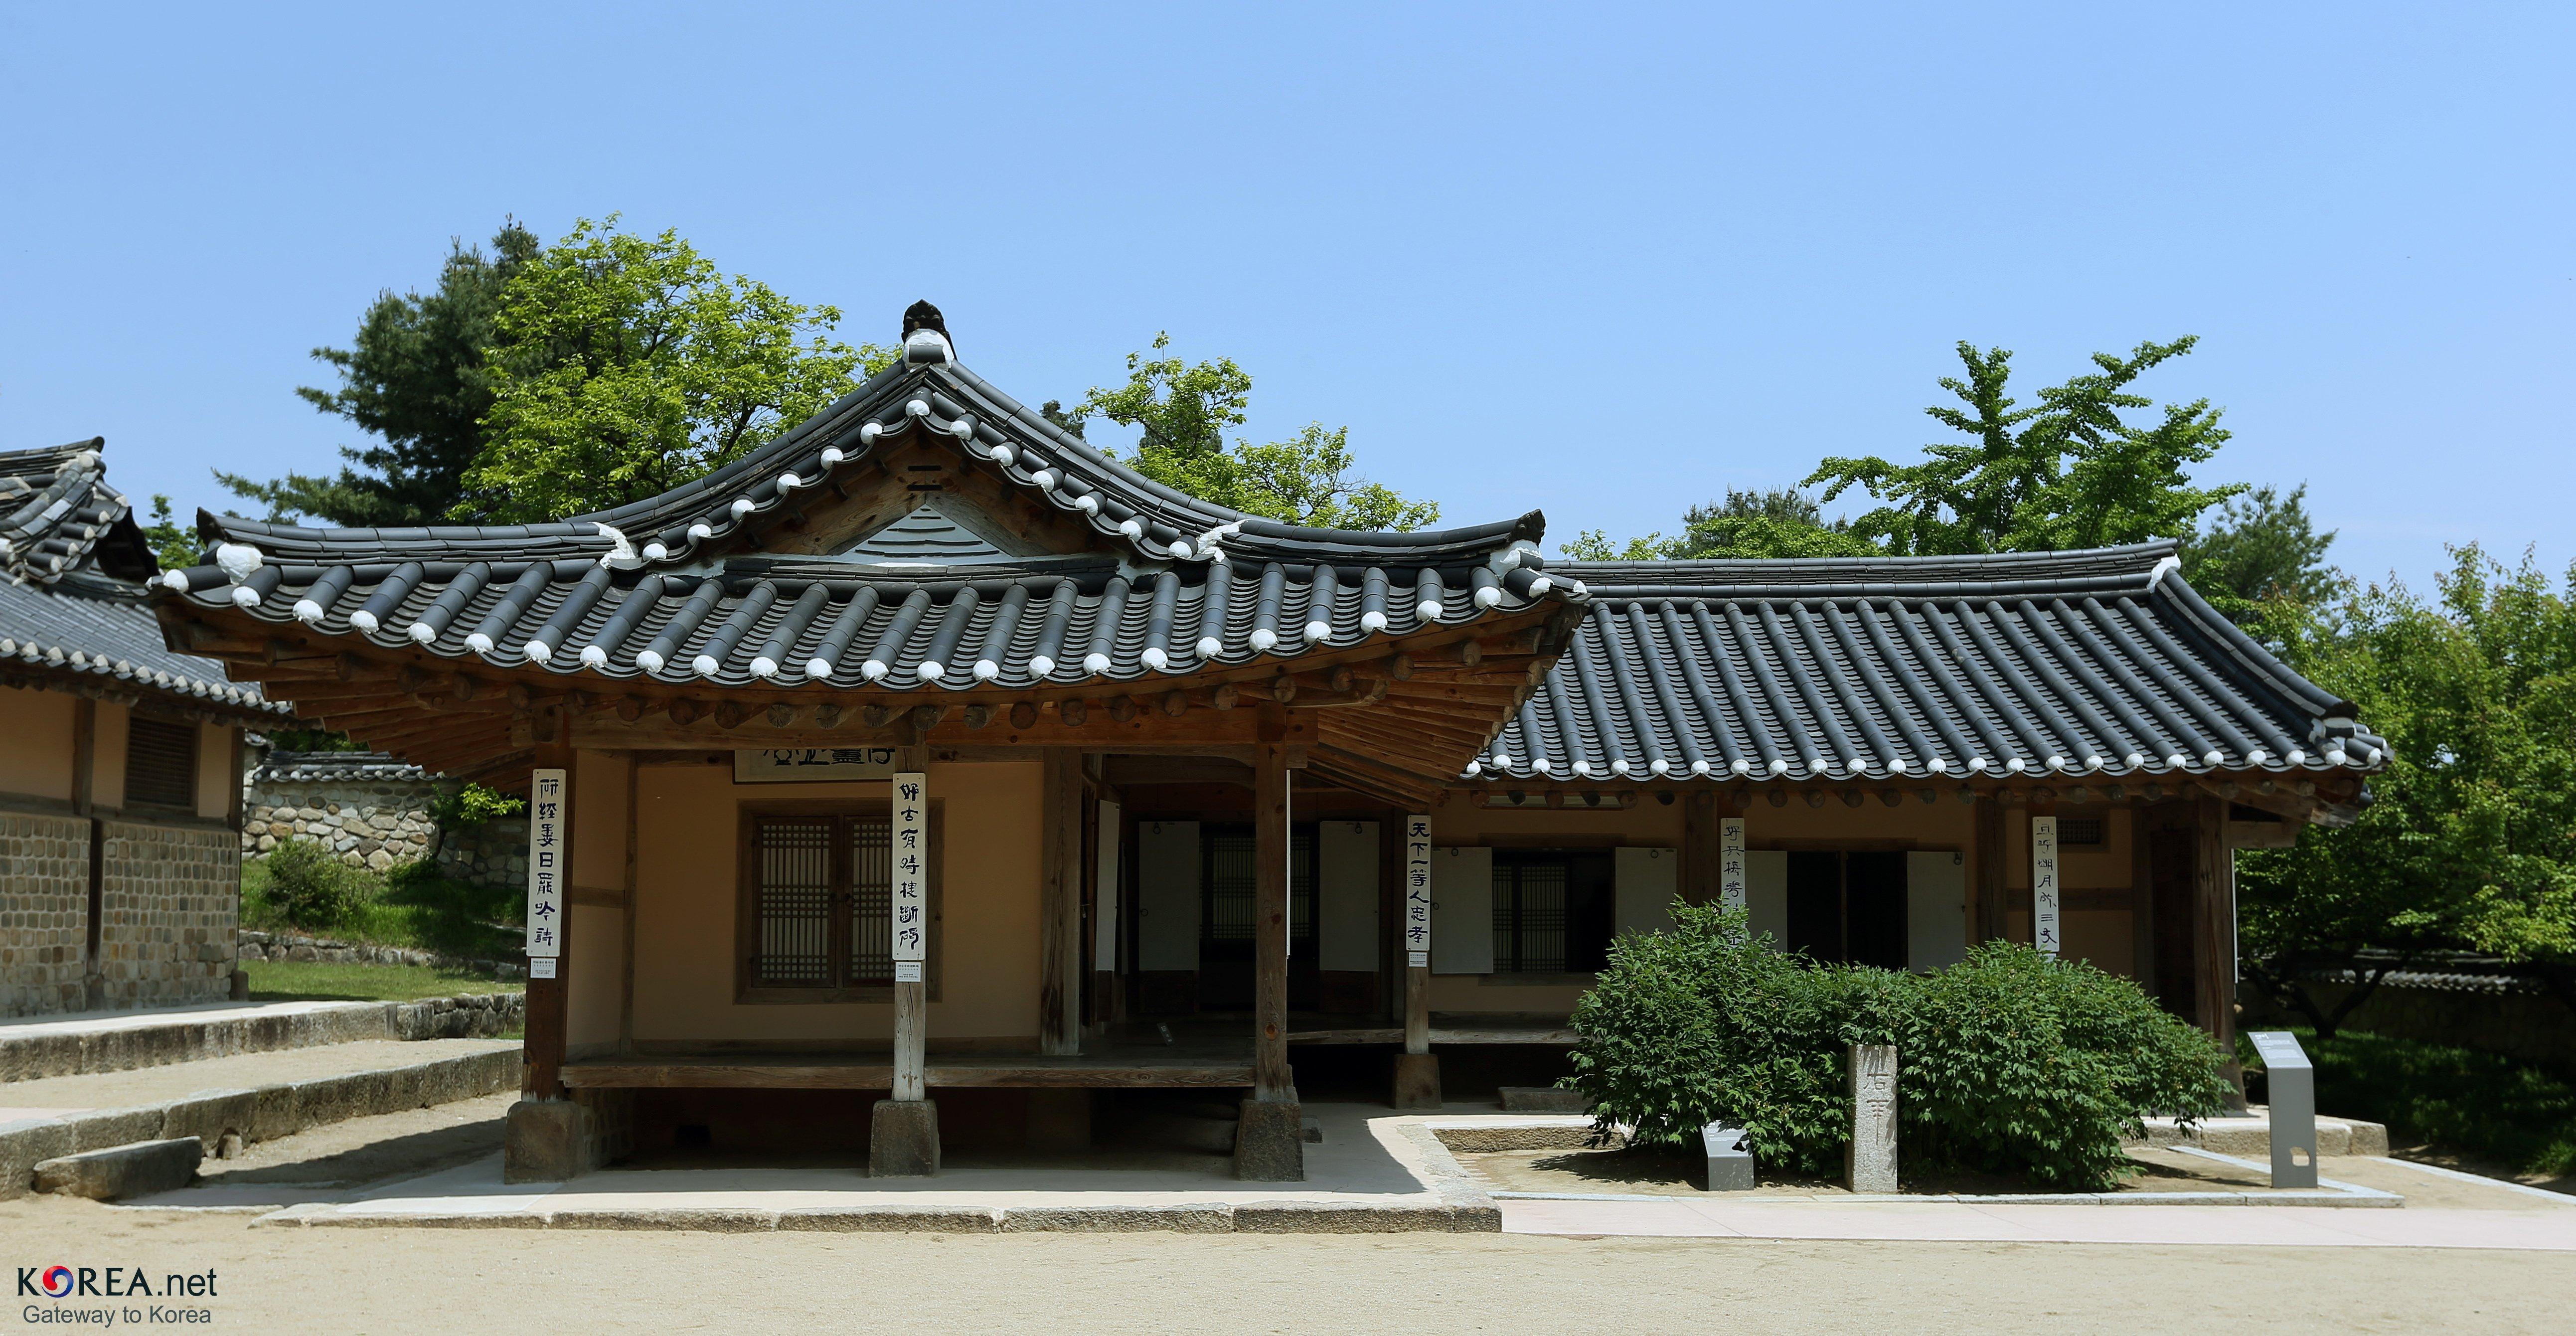 ^ ncient Korean rchitecture - ncient History ncyclopedia